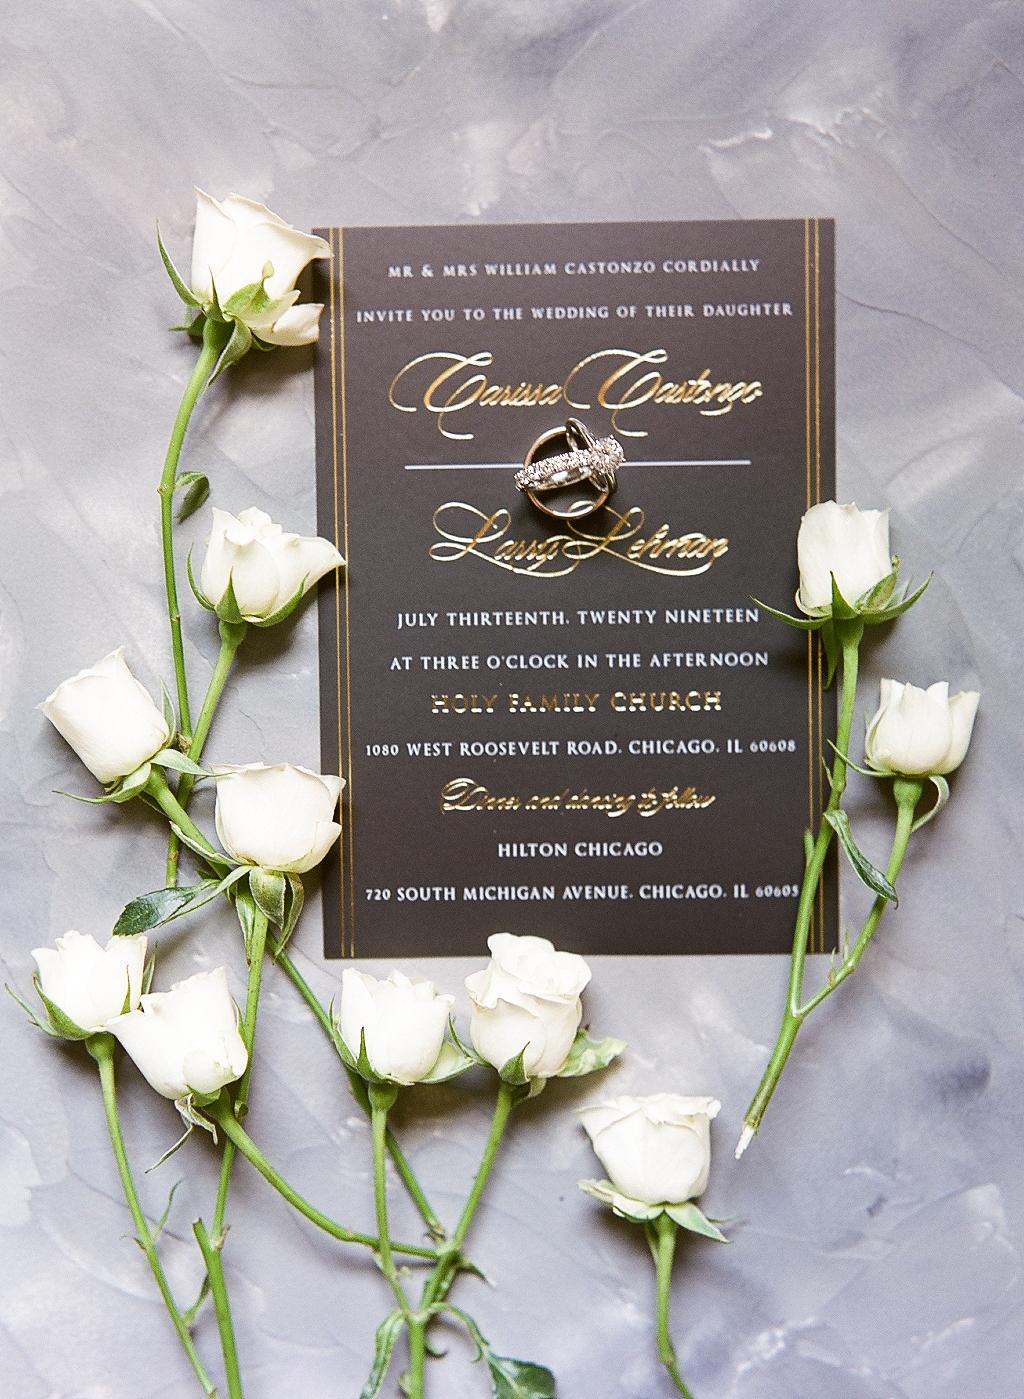 www.bonphotage.com Bonphotage Chicago Fine Art Wedding Photography